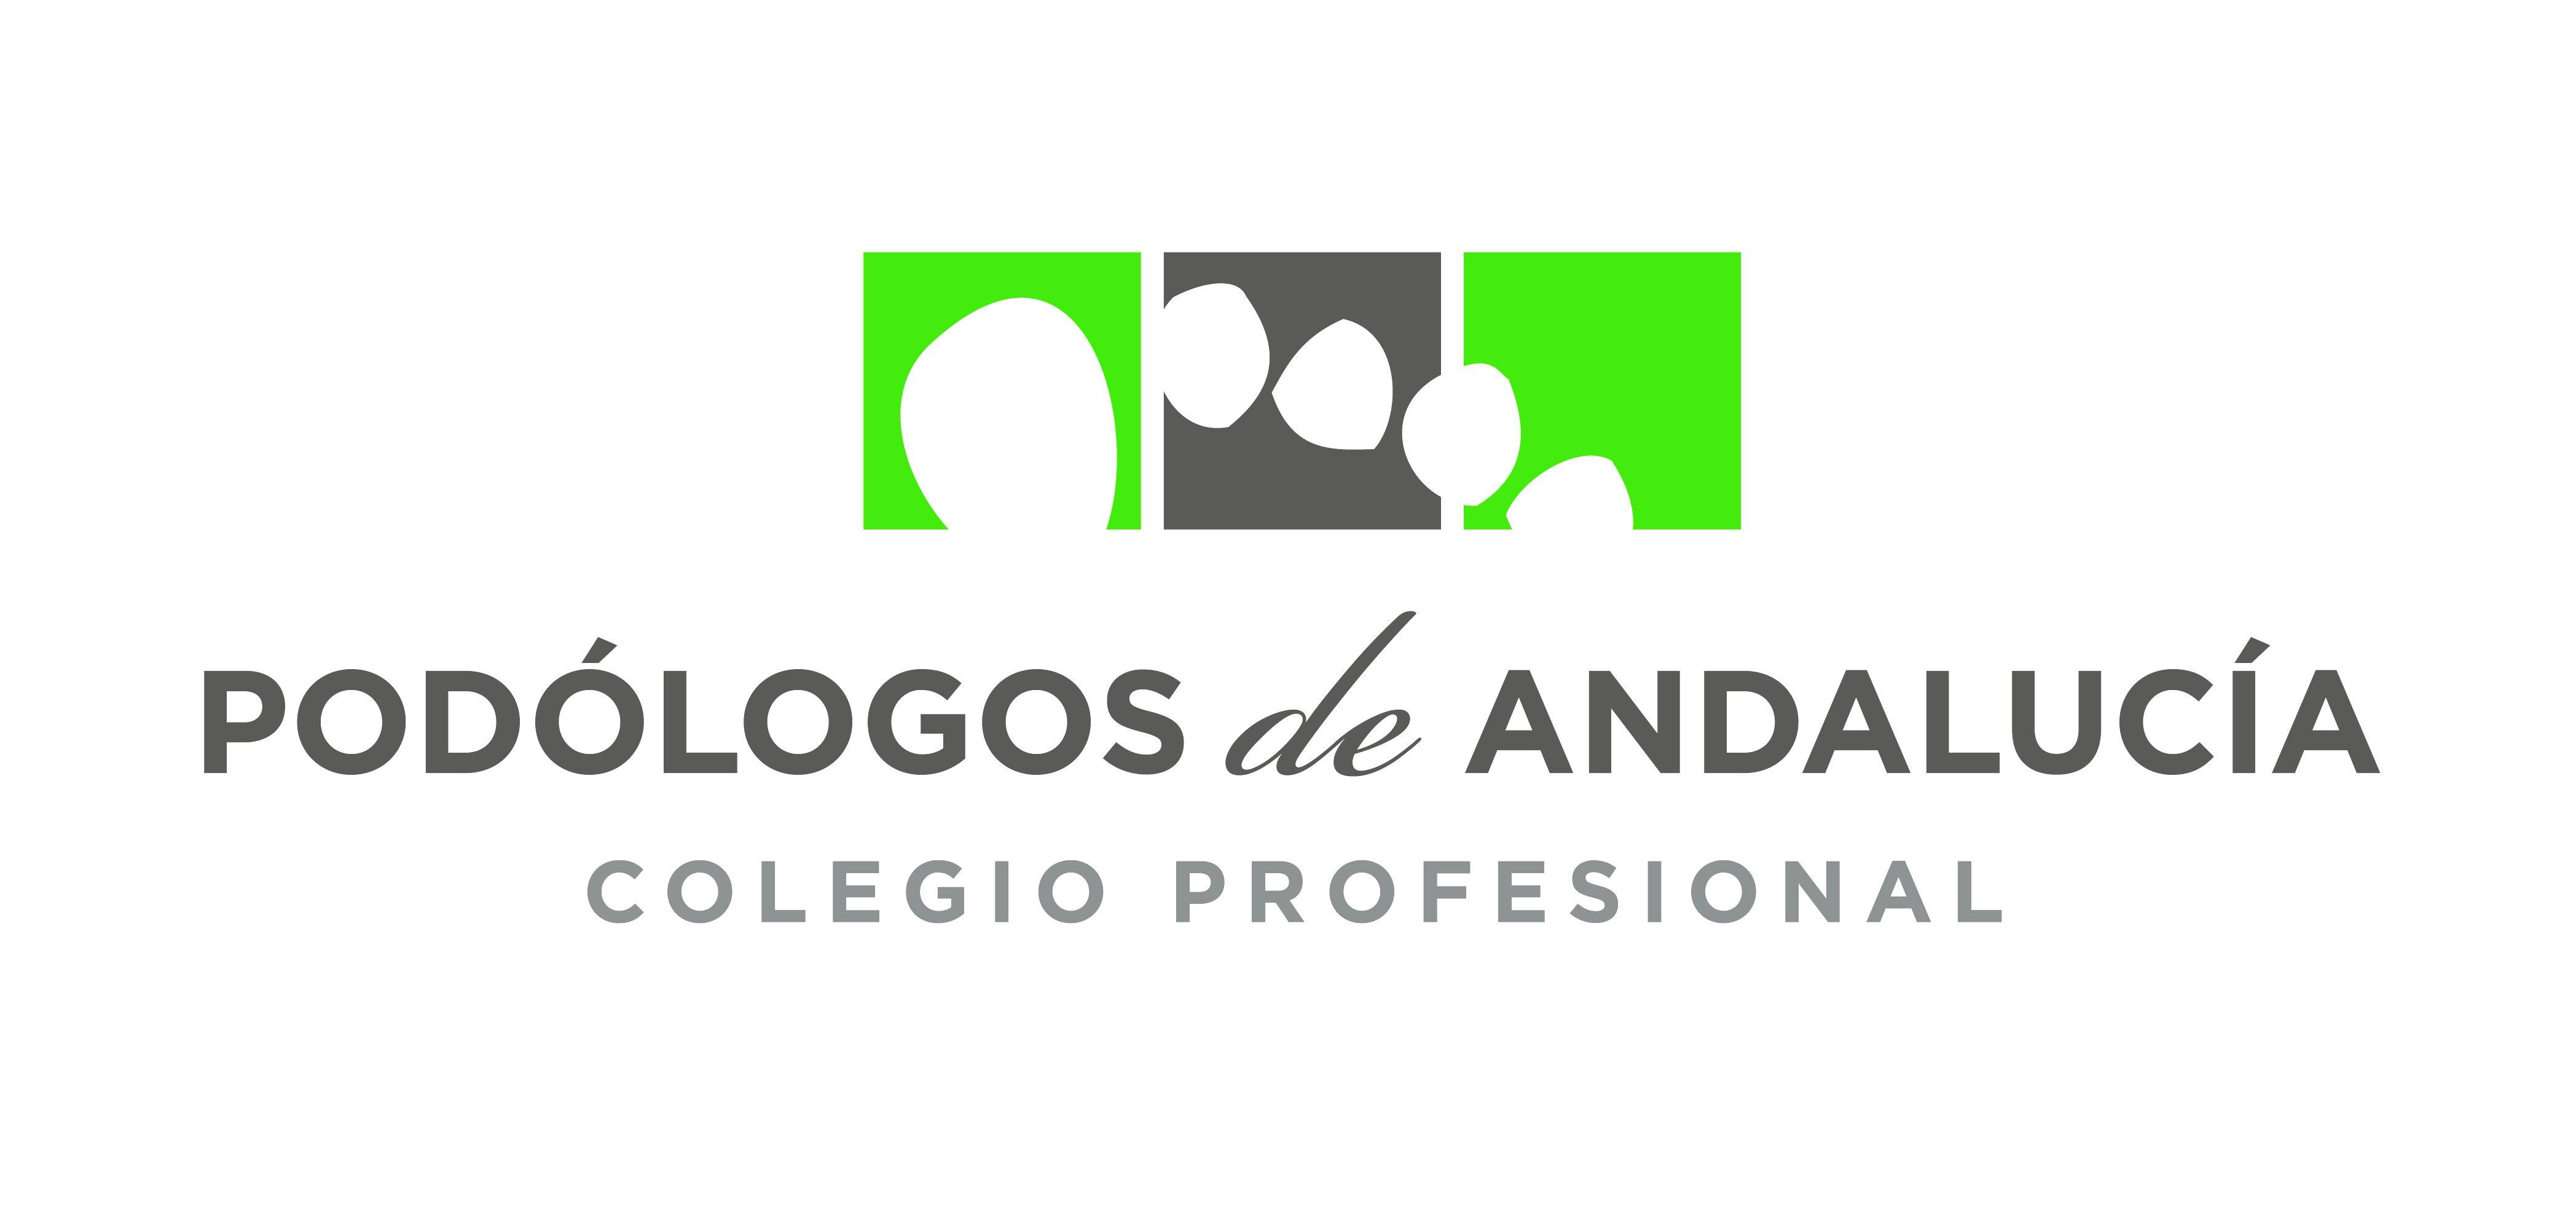 ROSARIO CORREA ASUME LA PRESIDENCIA DEL COLEGIO PROFESIONAL DE PODÓLOGOS DE ANDALUCÍA CON PEDRO CHAMIZO COMO VOCAL DE MÁLAGA